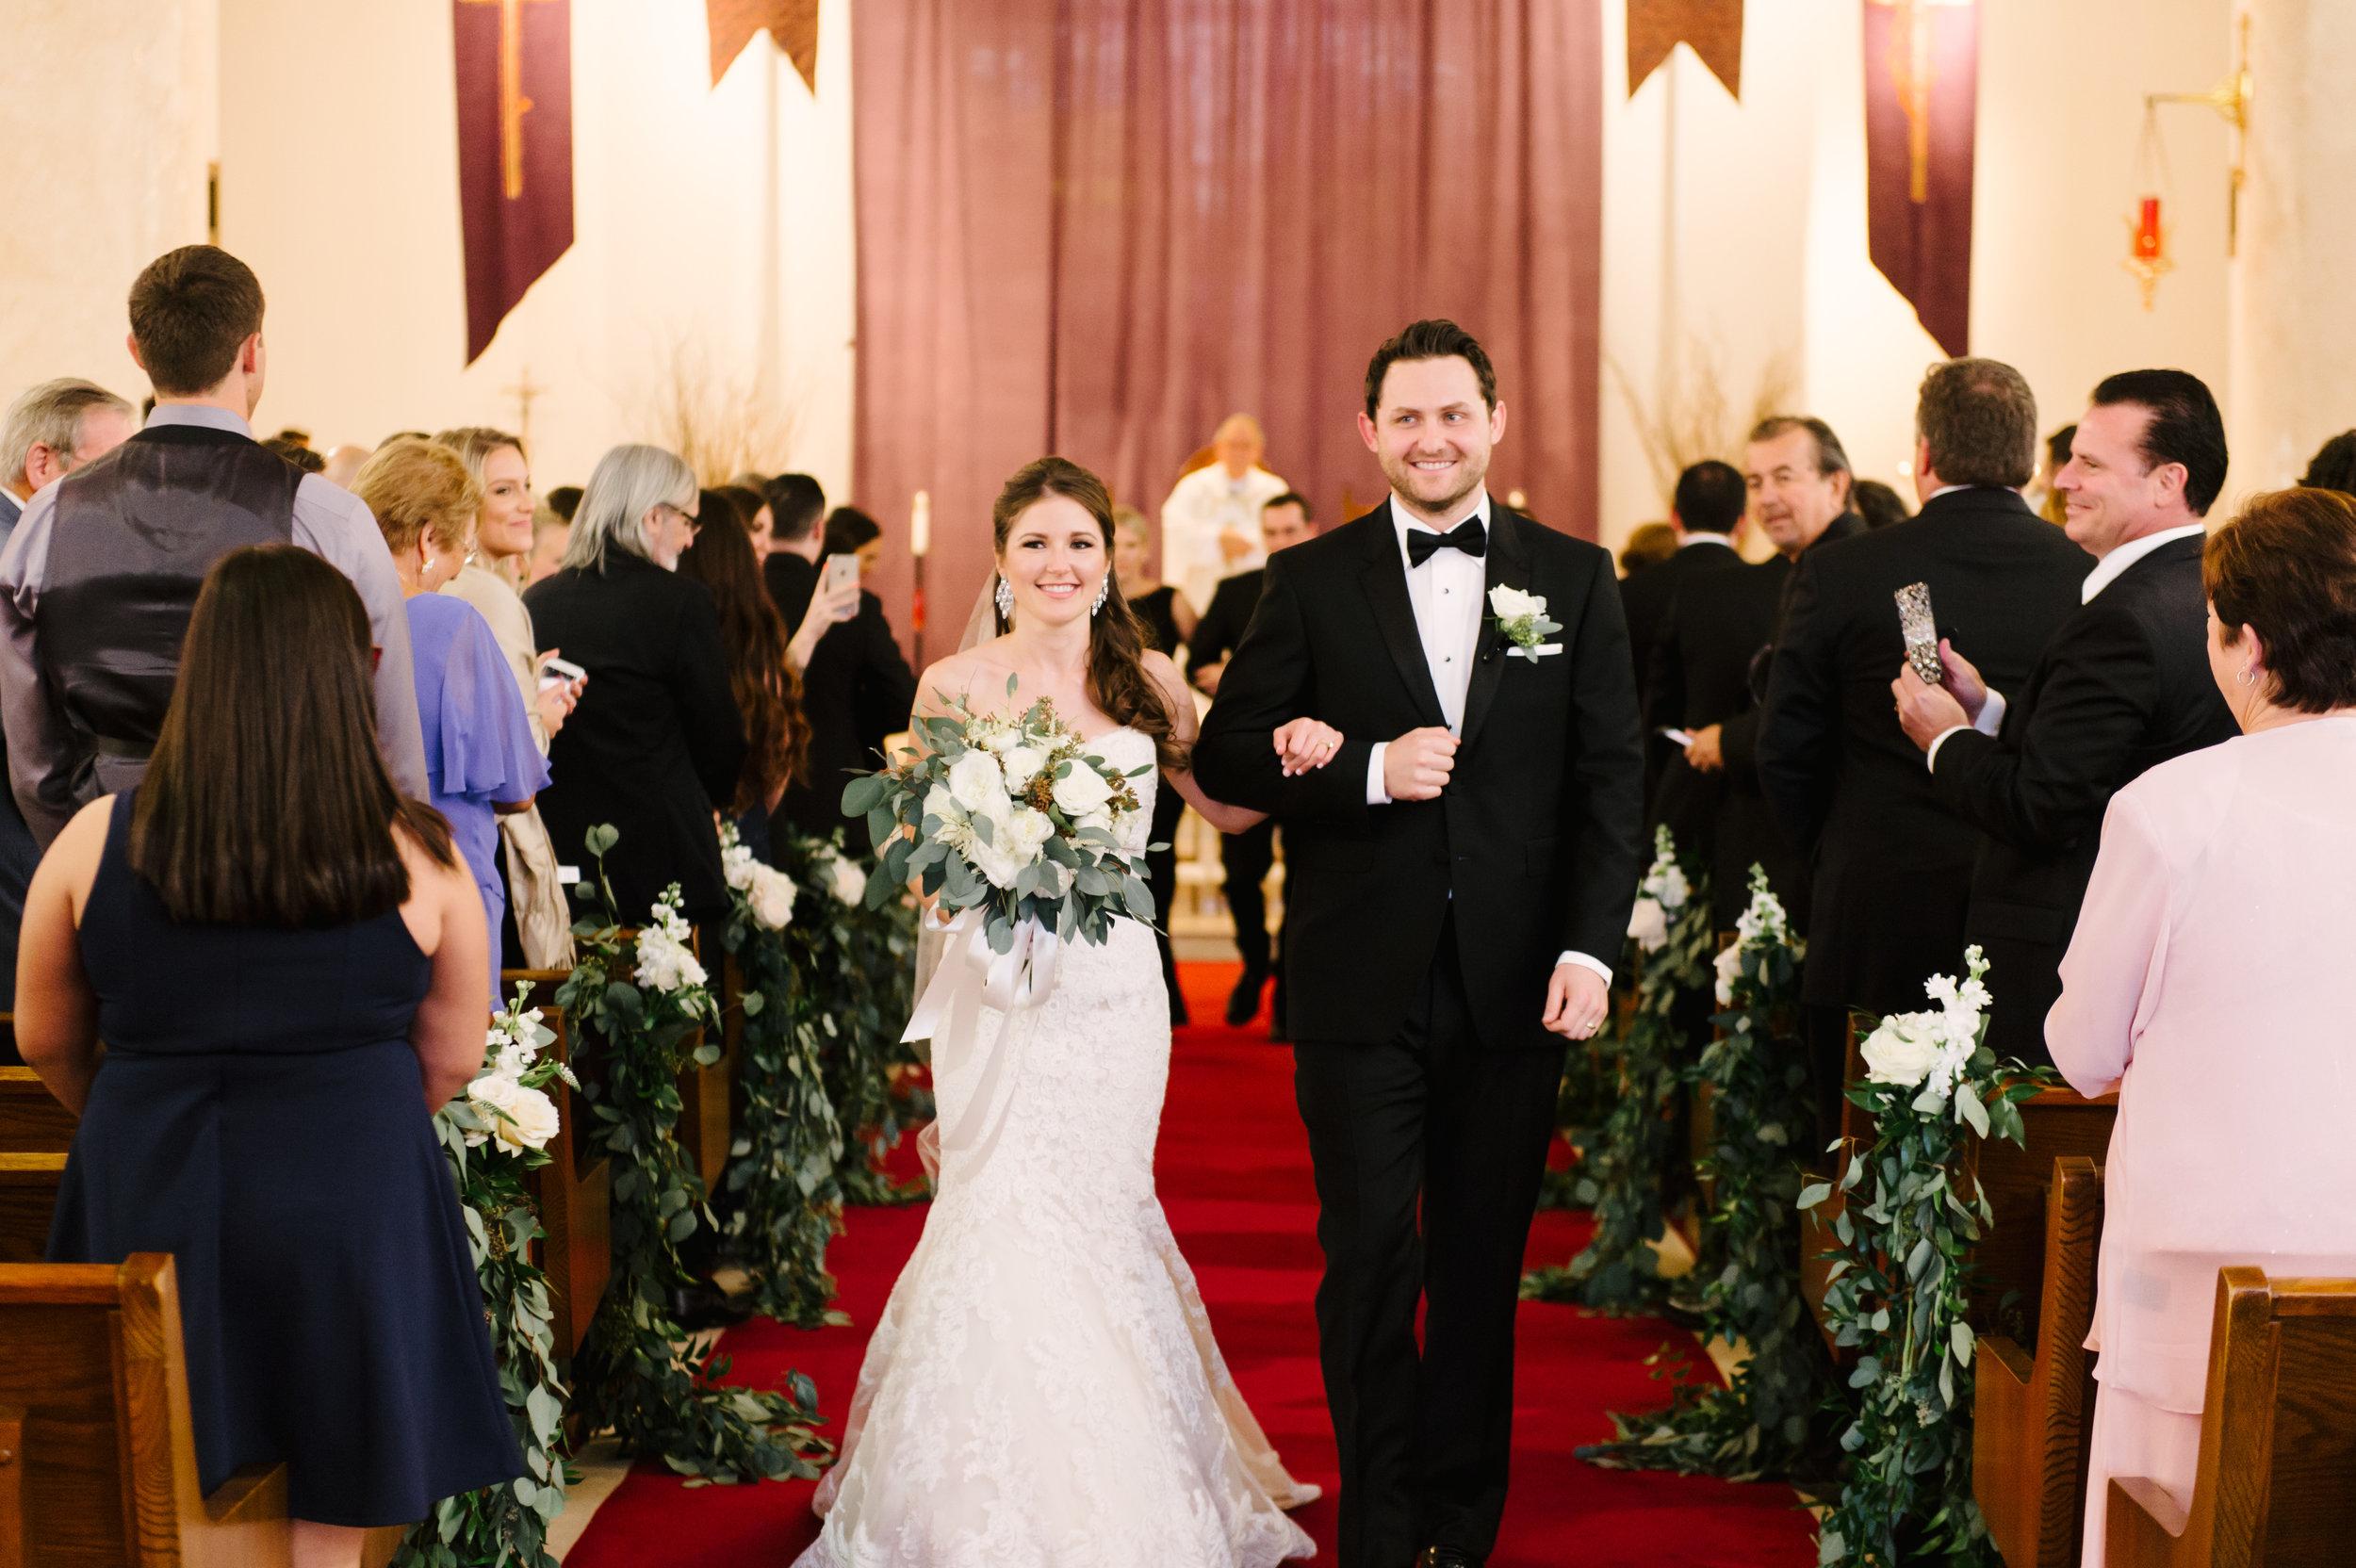 The seriously stylish new Mr. & Mrs.